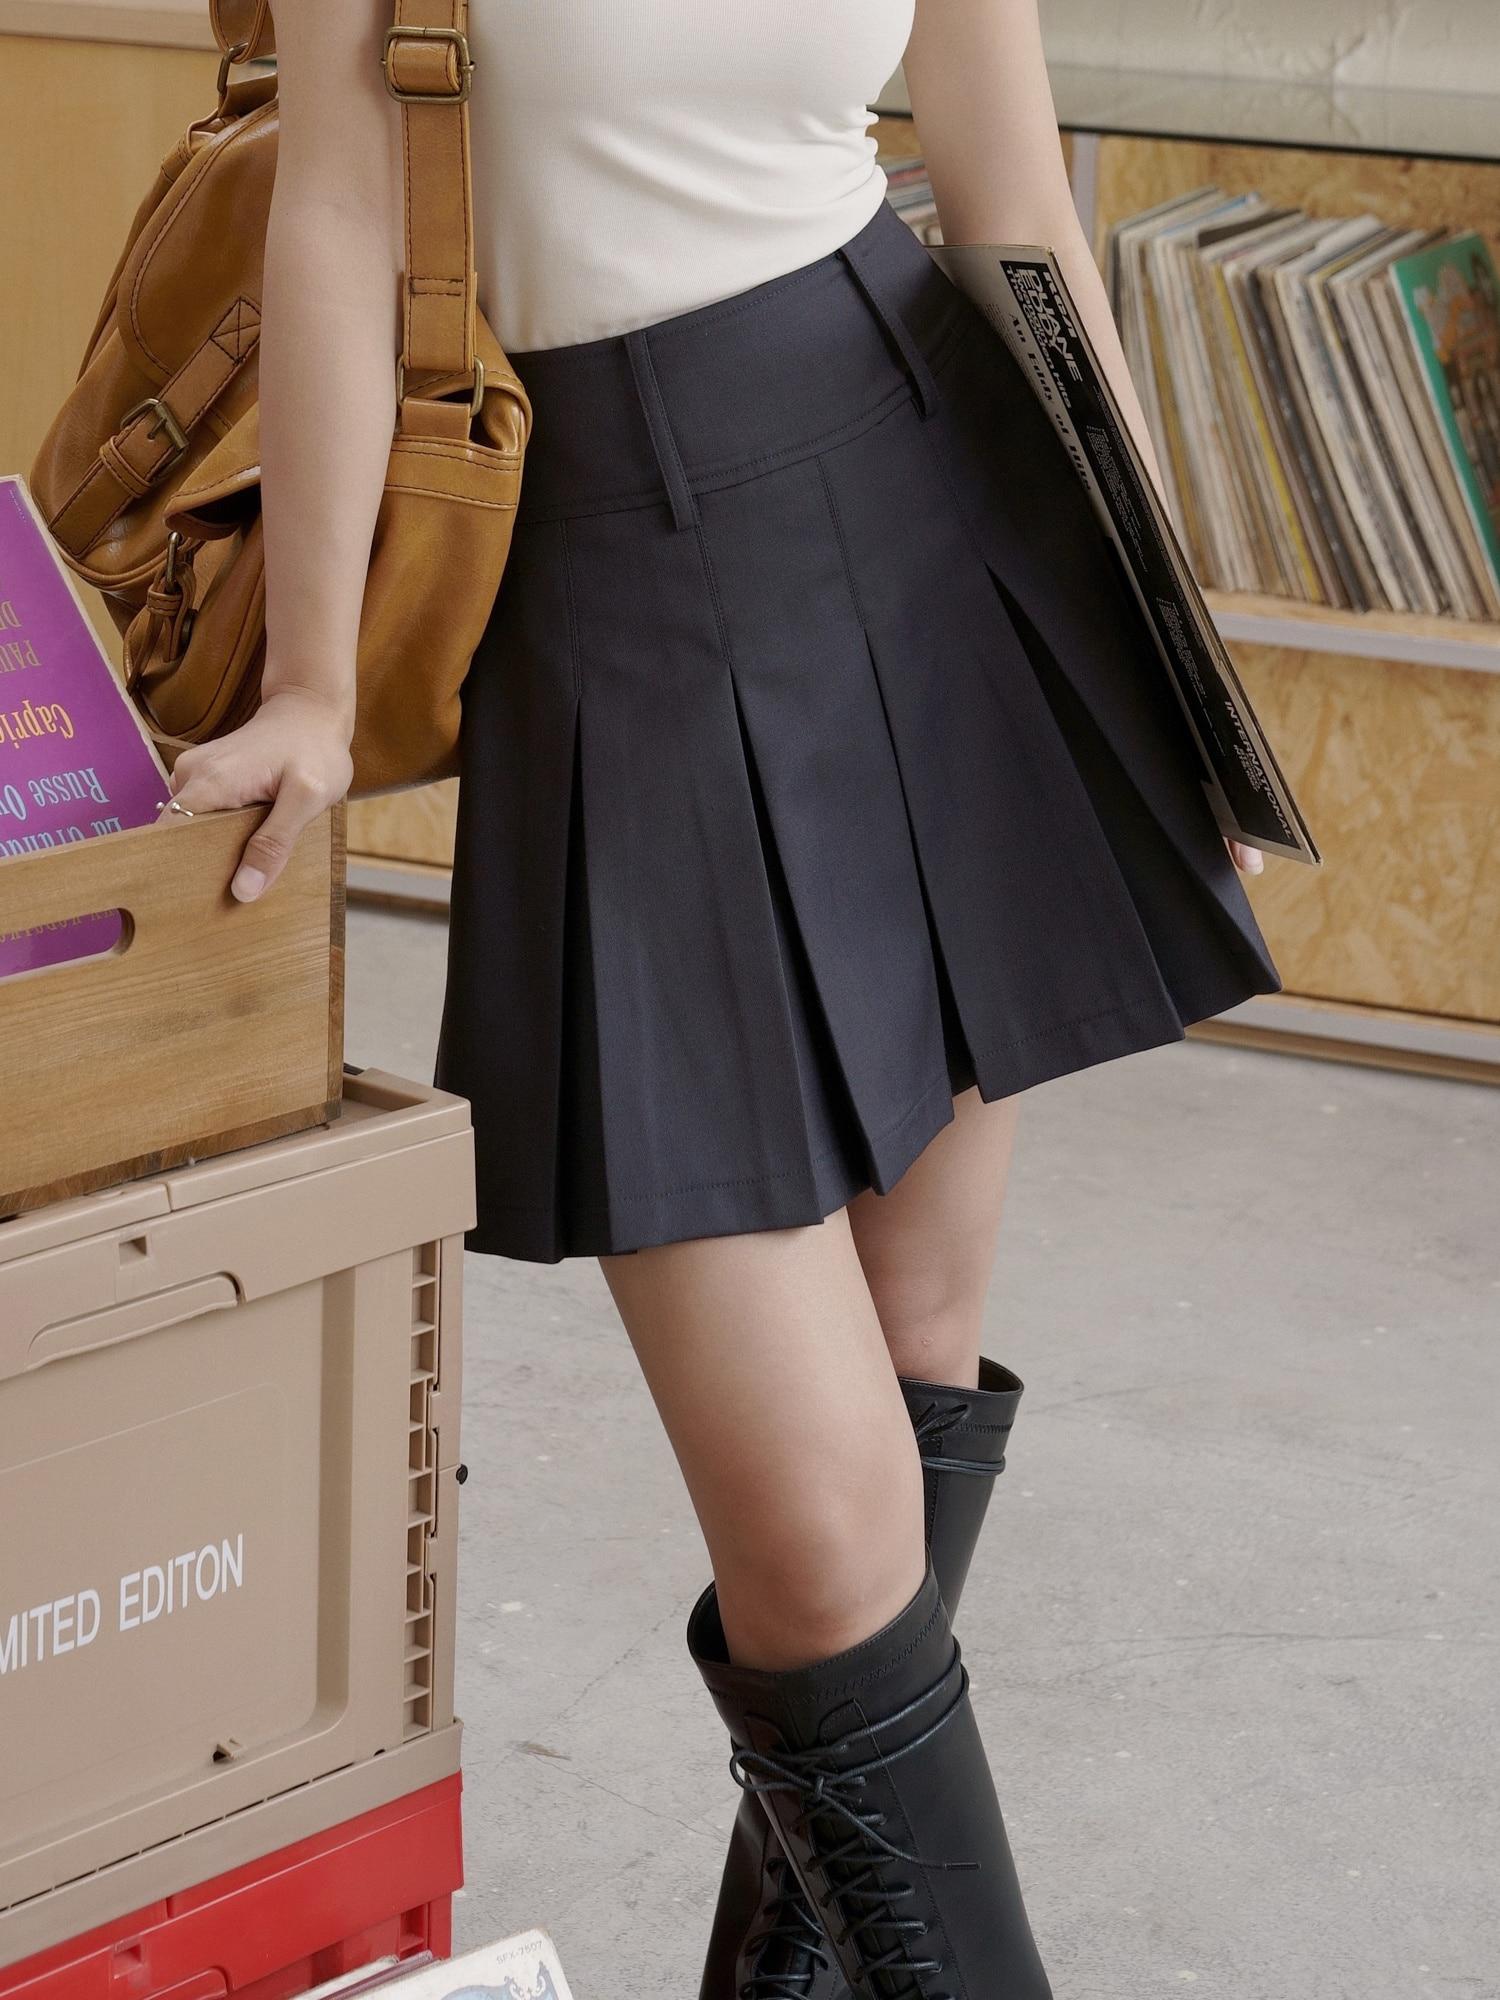 College Student Uniform Skirt High Waist Pleated Skirt 2021 Summer Black Covered Crotch Thin Skirt W